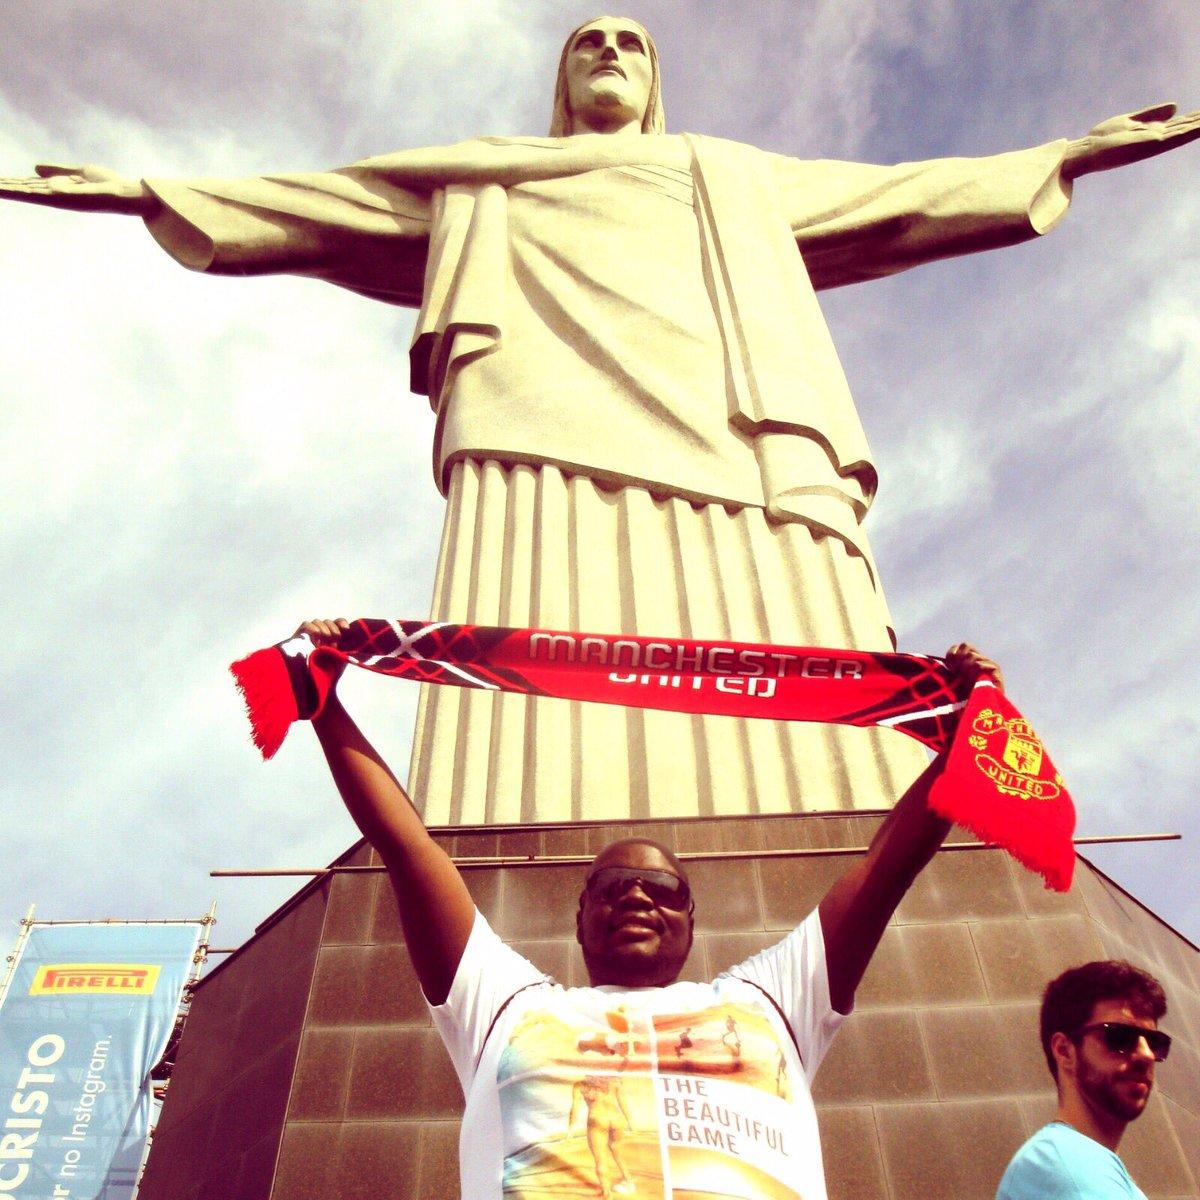 WC2014  #Christtheredeemer #rio #brazil #mufc #tbt https://t.co/bgyGp3rRjK